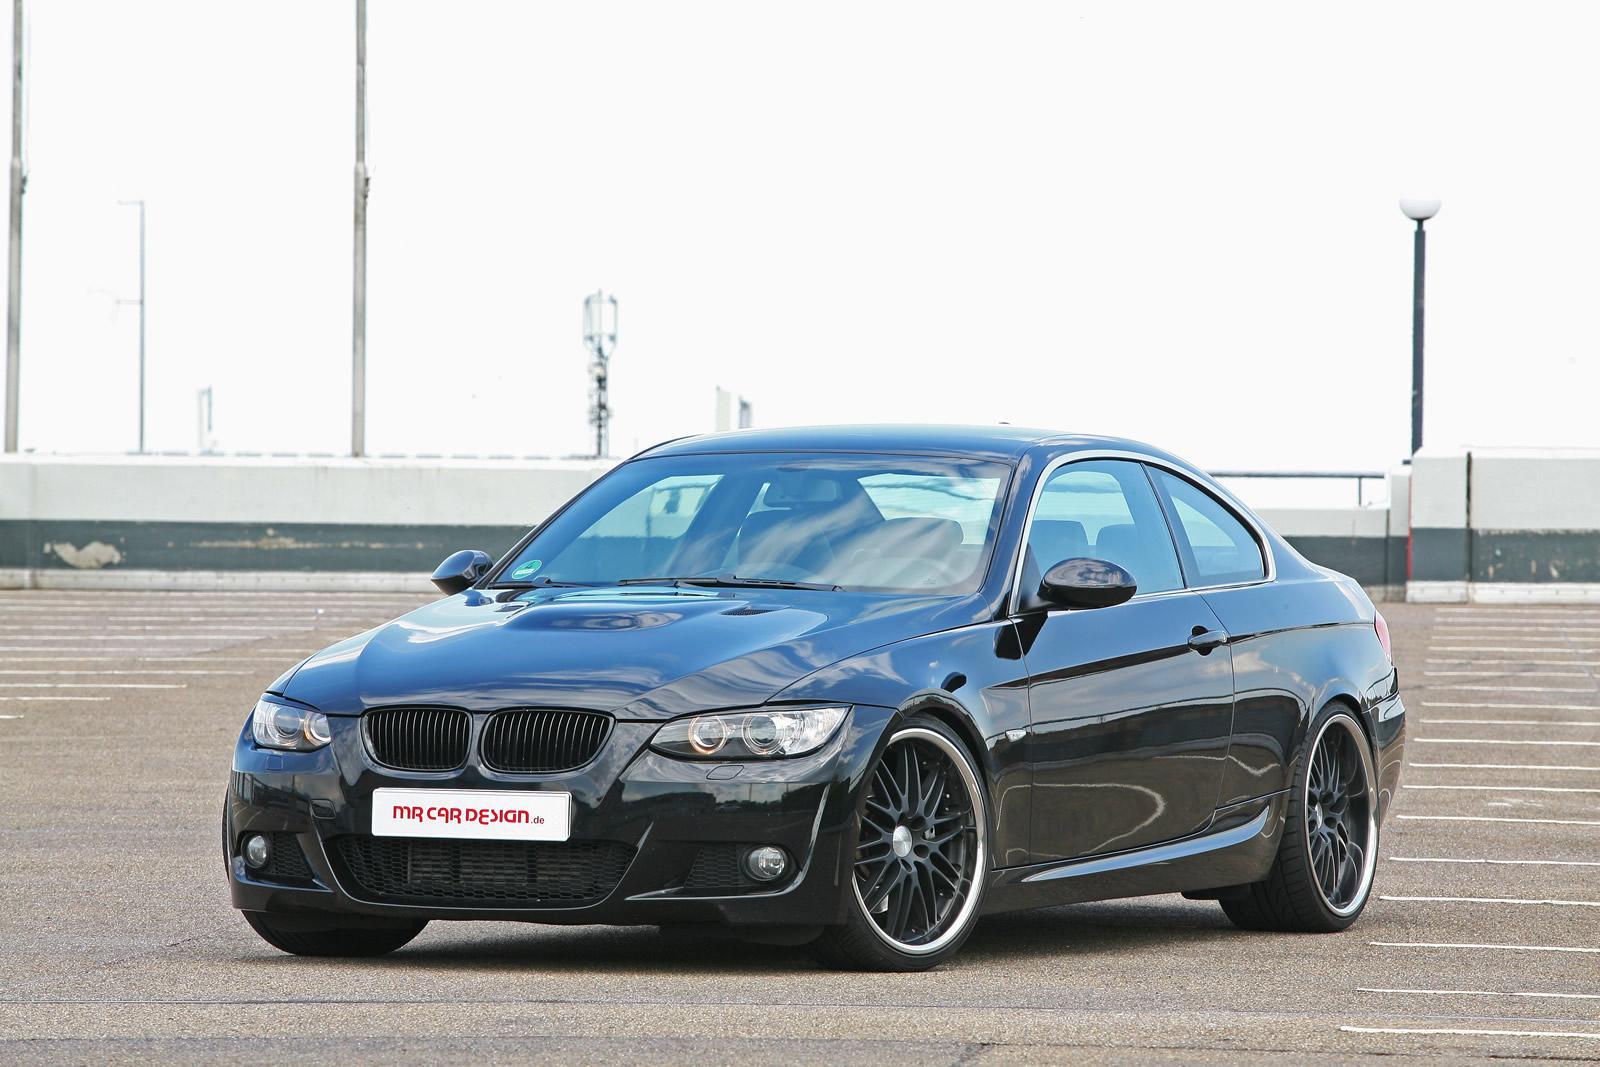 http://www.automobilesreview.com/img/mr-car-design-bmw-335i-black-scorpion/mr-car-design-bmw-335i-black-scorpion-10.jpg